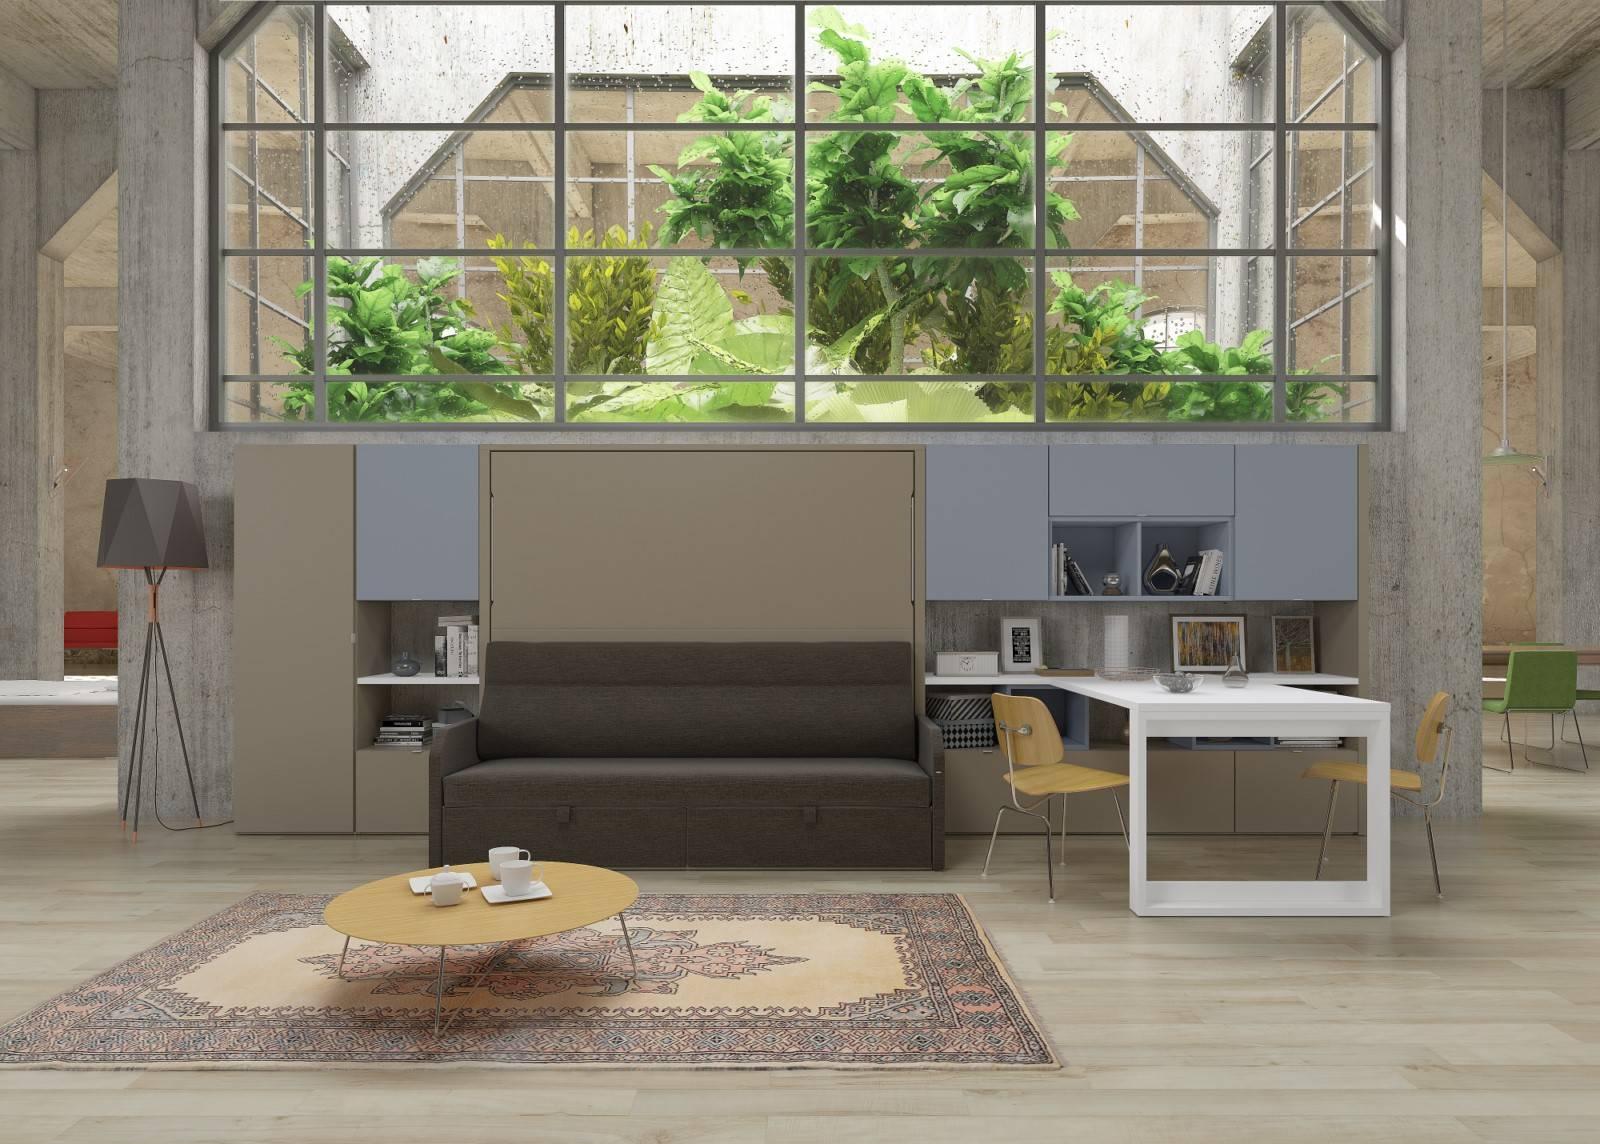 lit escamotable avec canap hy res compact horizontal auto. Black Bedroom Furniture Sets. Home Design Ideas